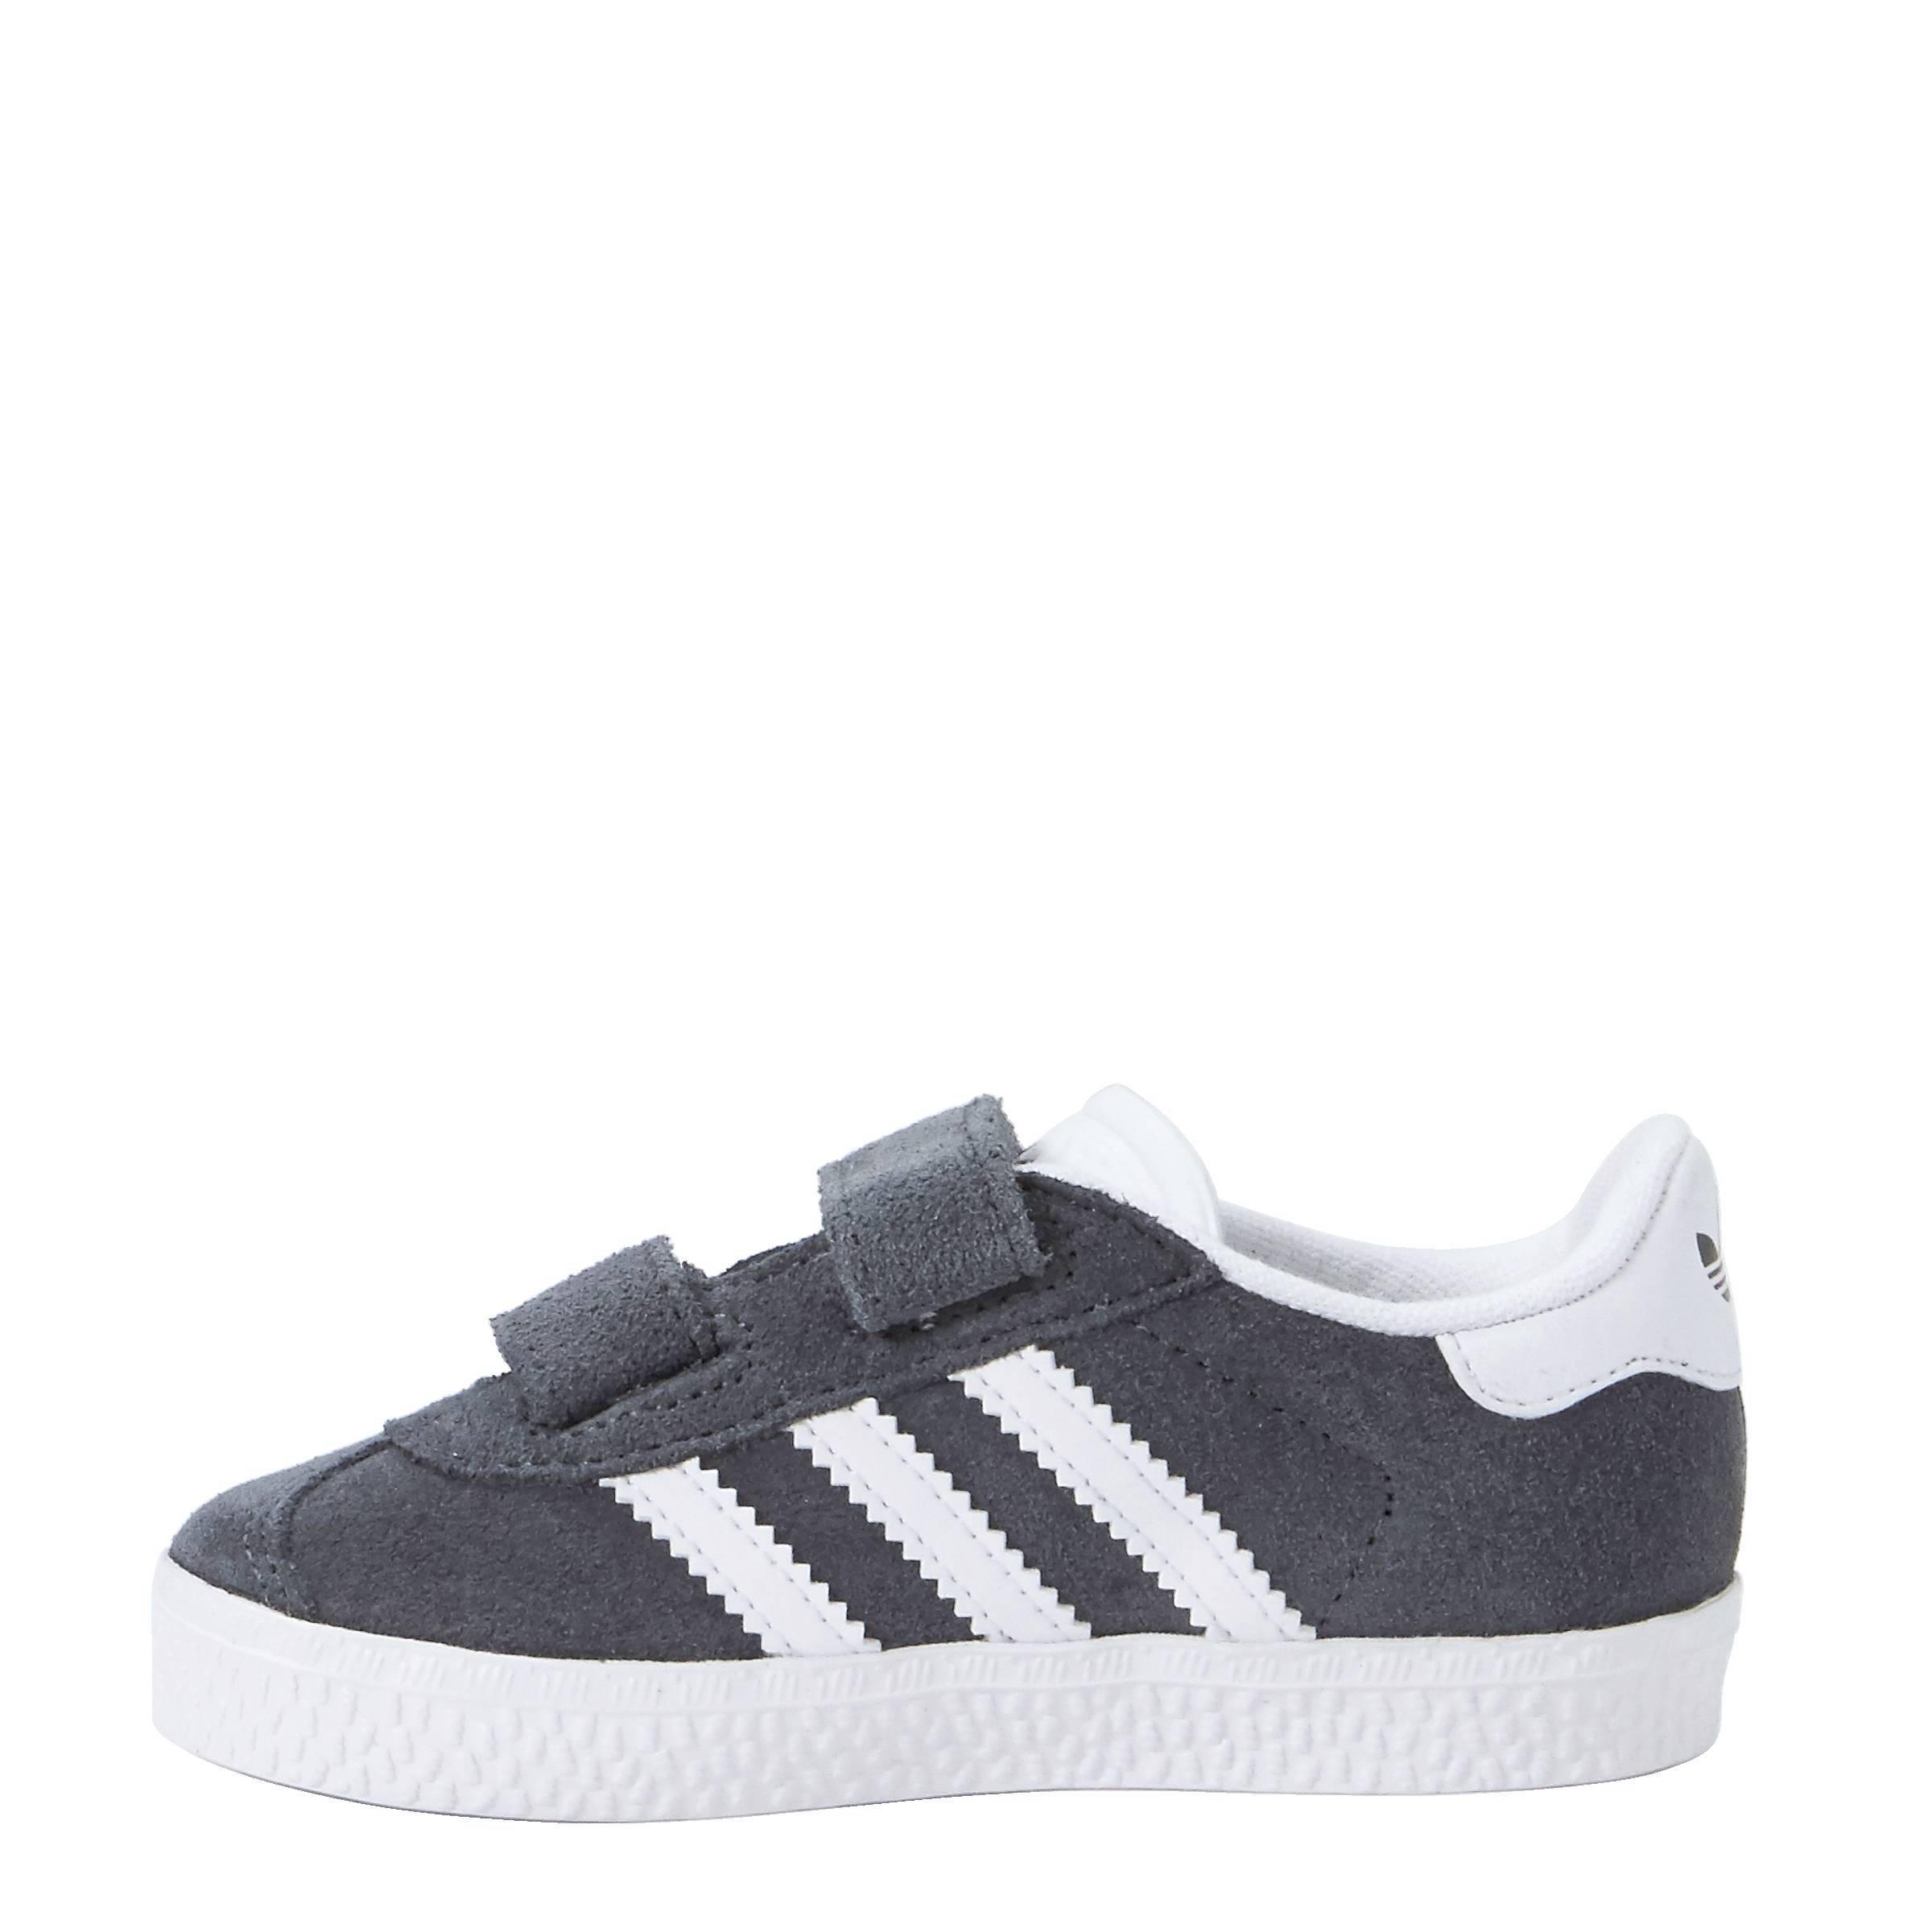 edf811c6e71 adidas originals Gazelle CF I sneakers